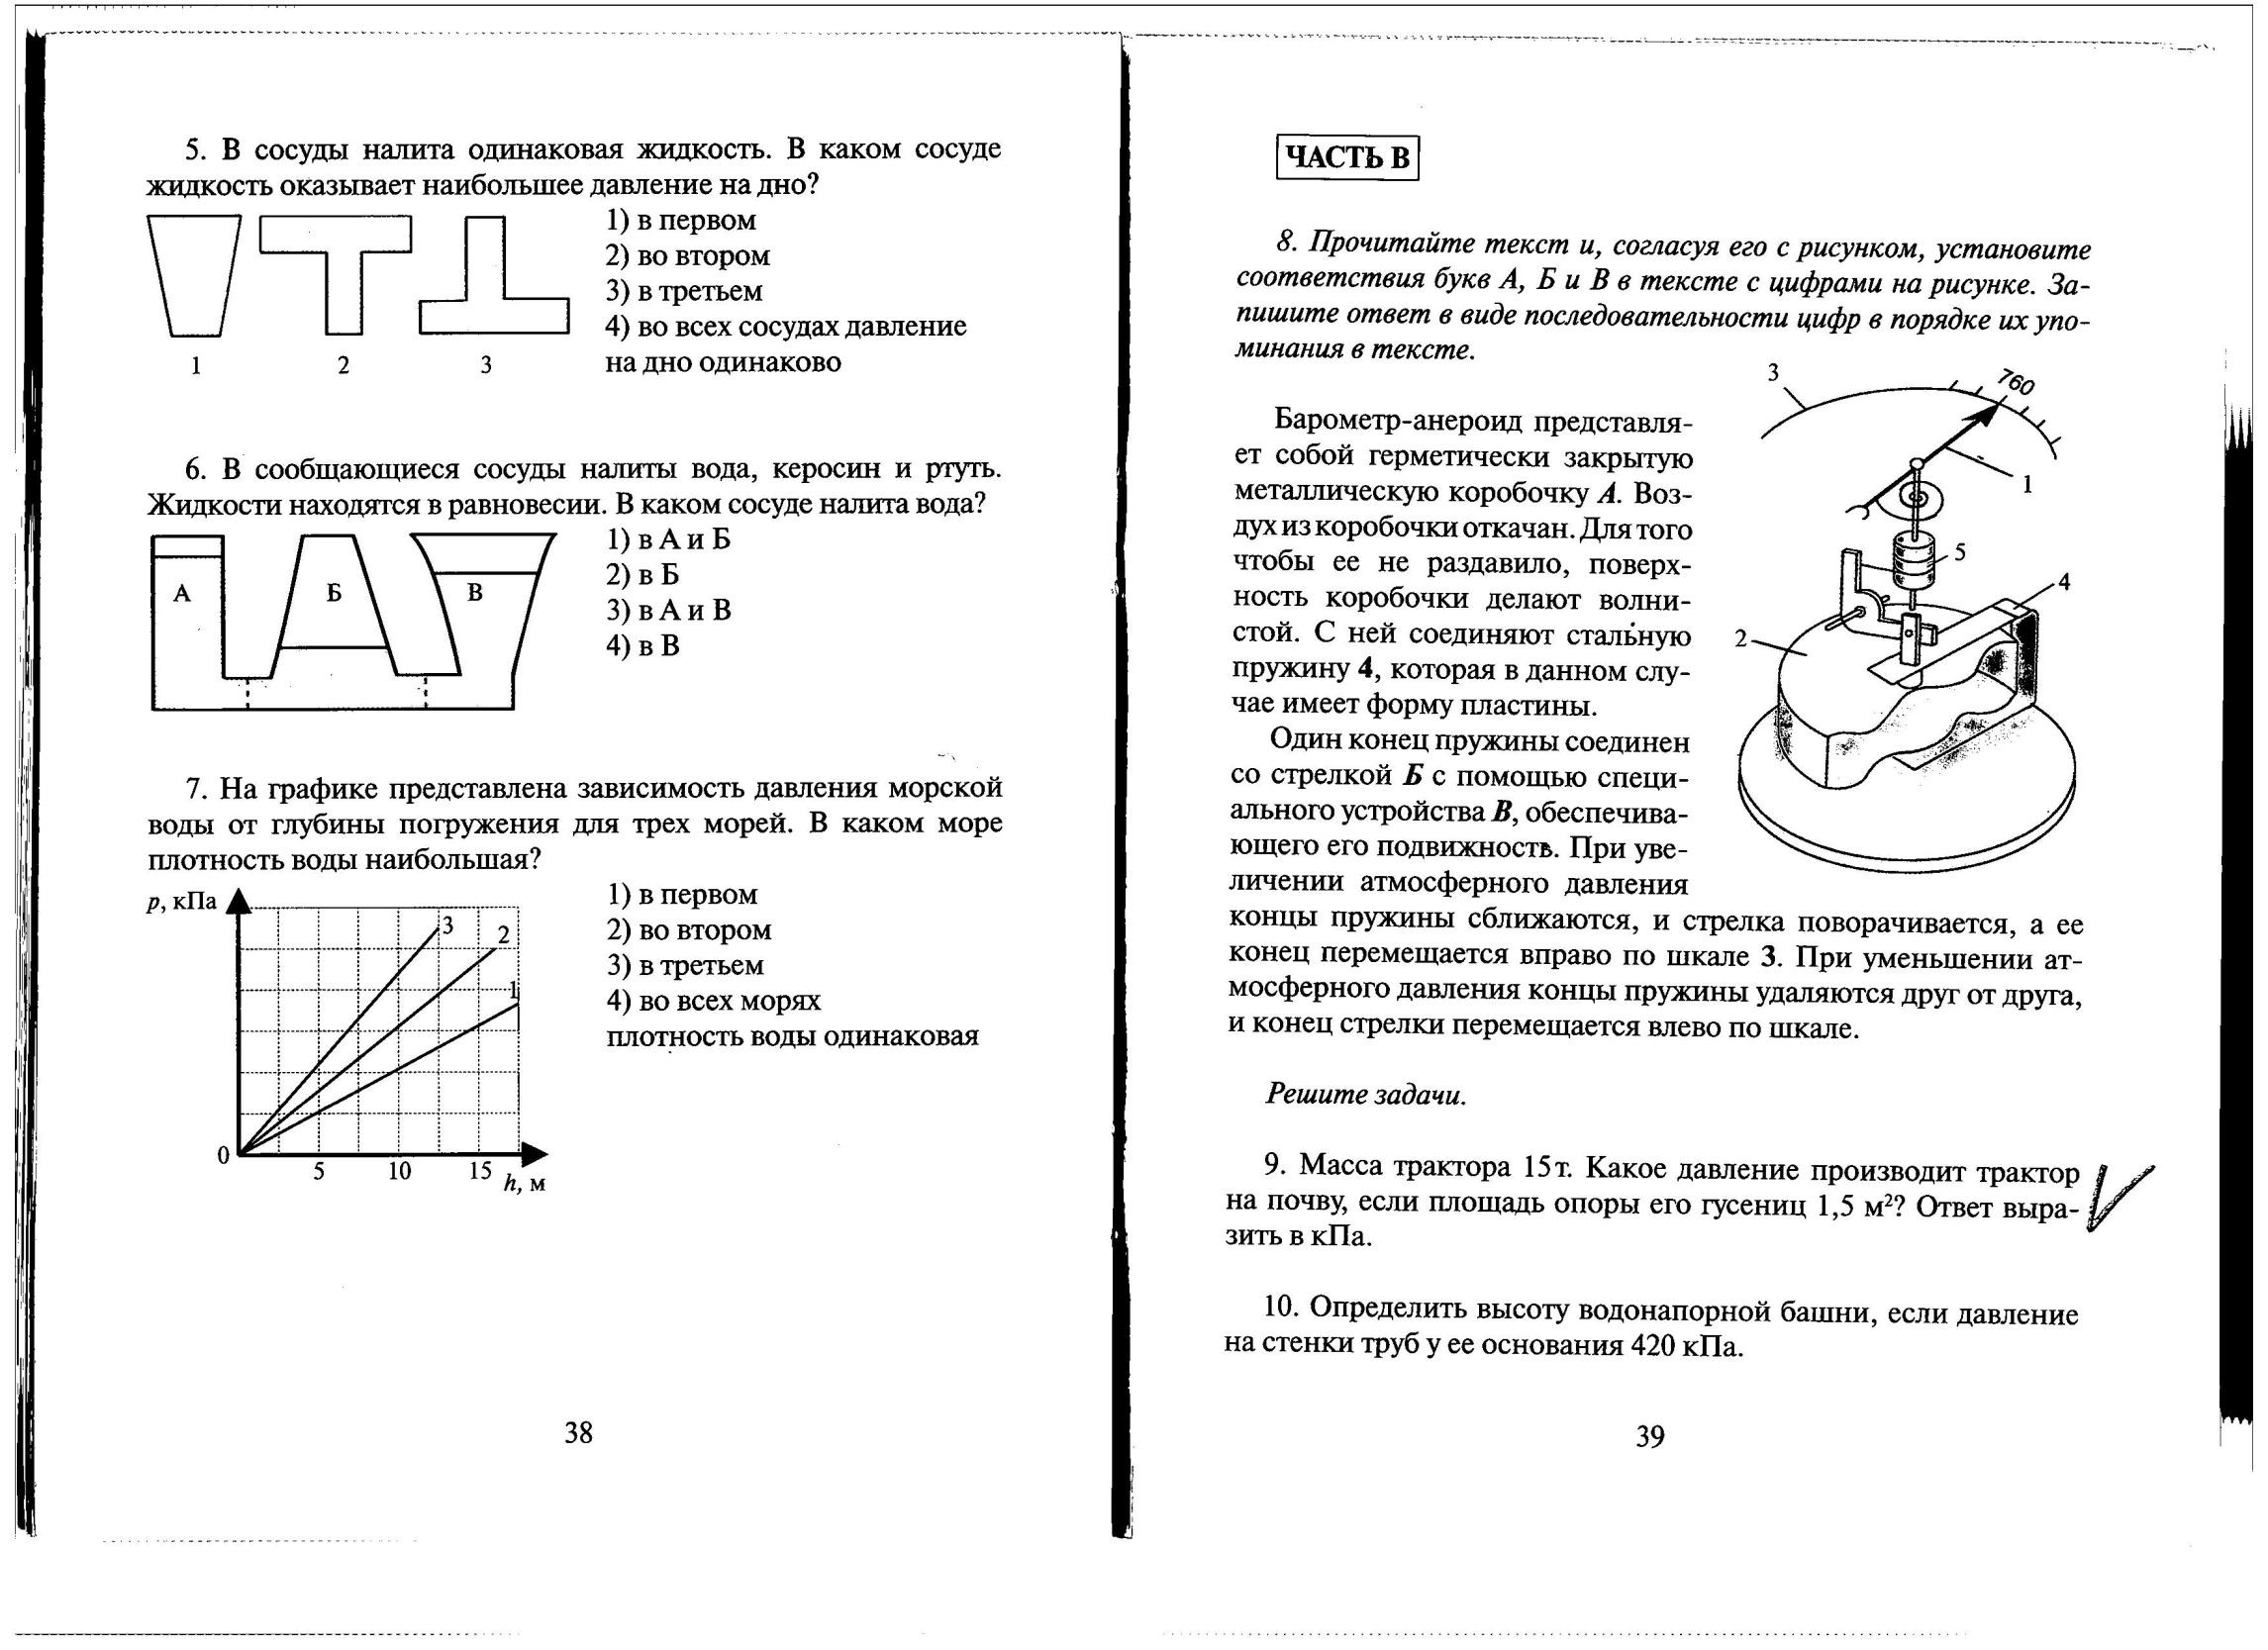 C:\Users\1\Desktop\физика 7 класс кр\15.jpeg